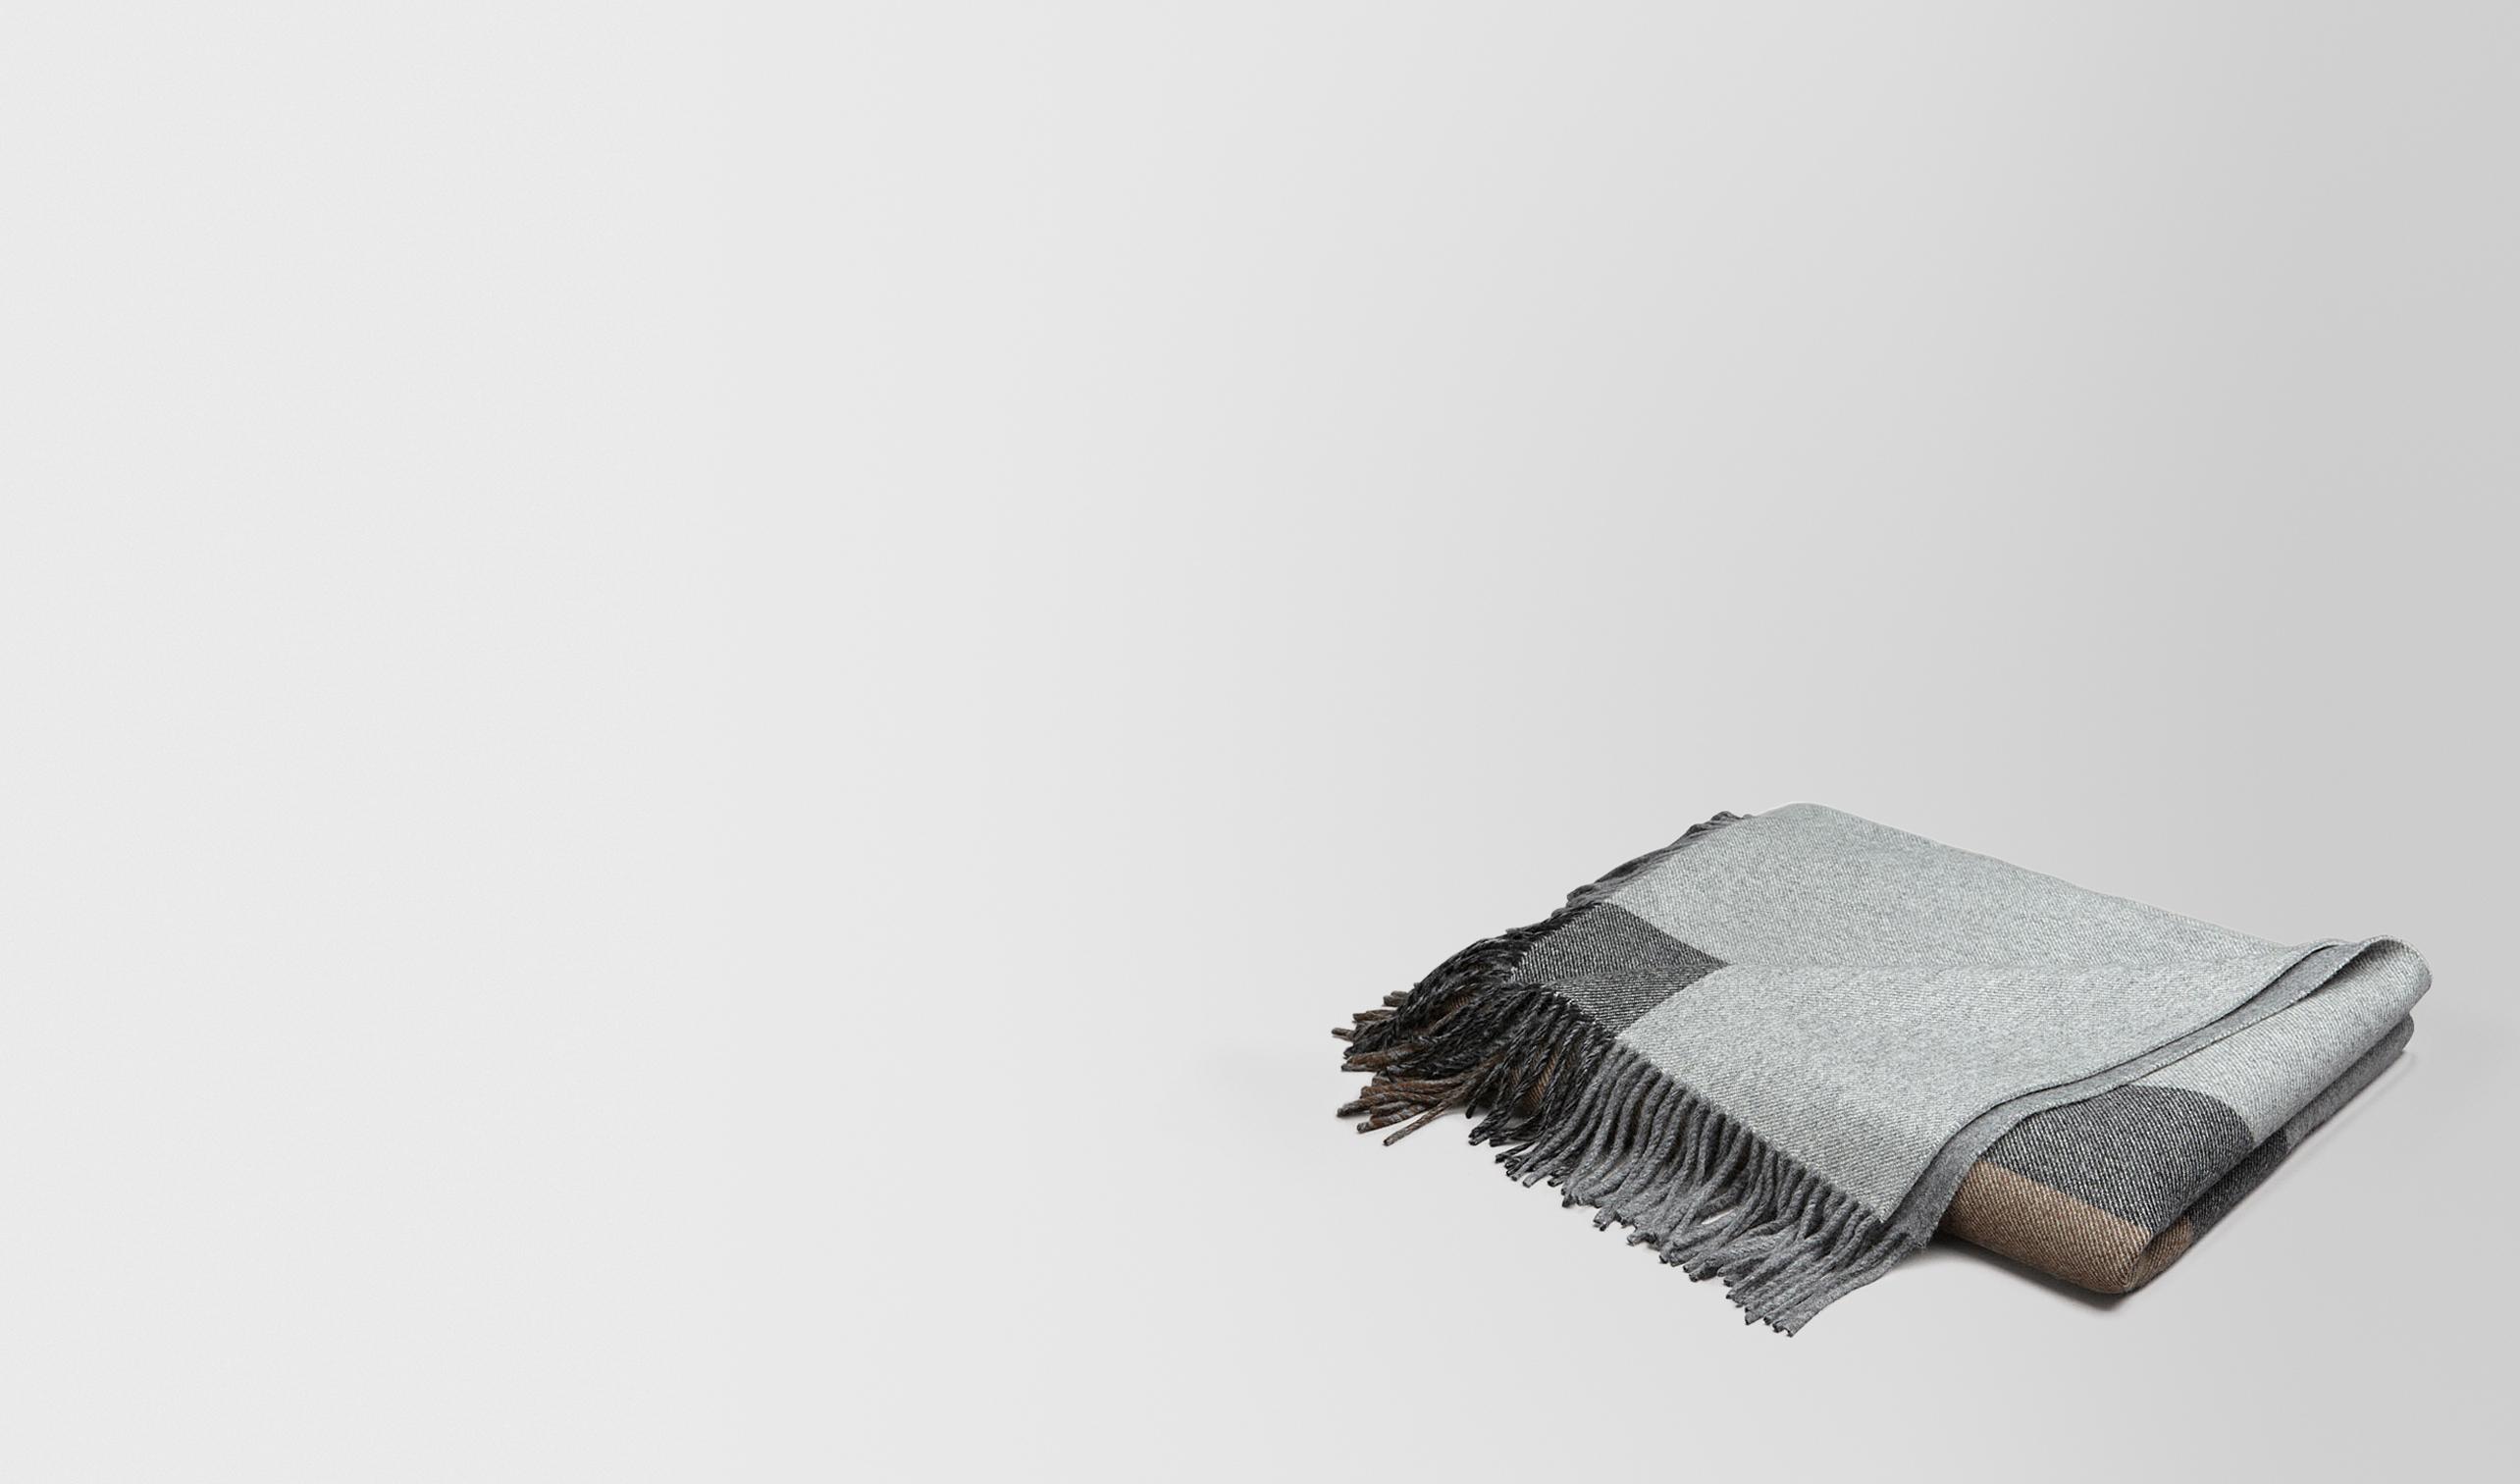 BOTTEGA VENETA Pillow and blanket E BLANKET IN ANTHRACITE BLACK CASHMERE pl